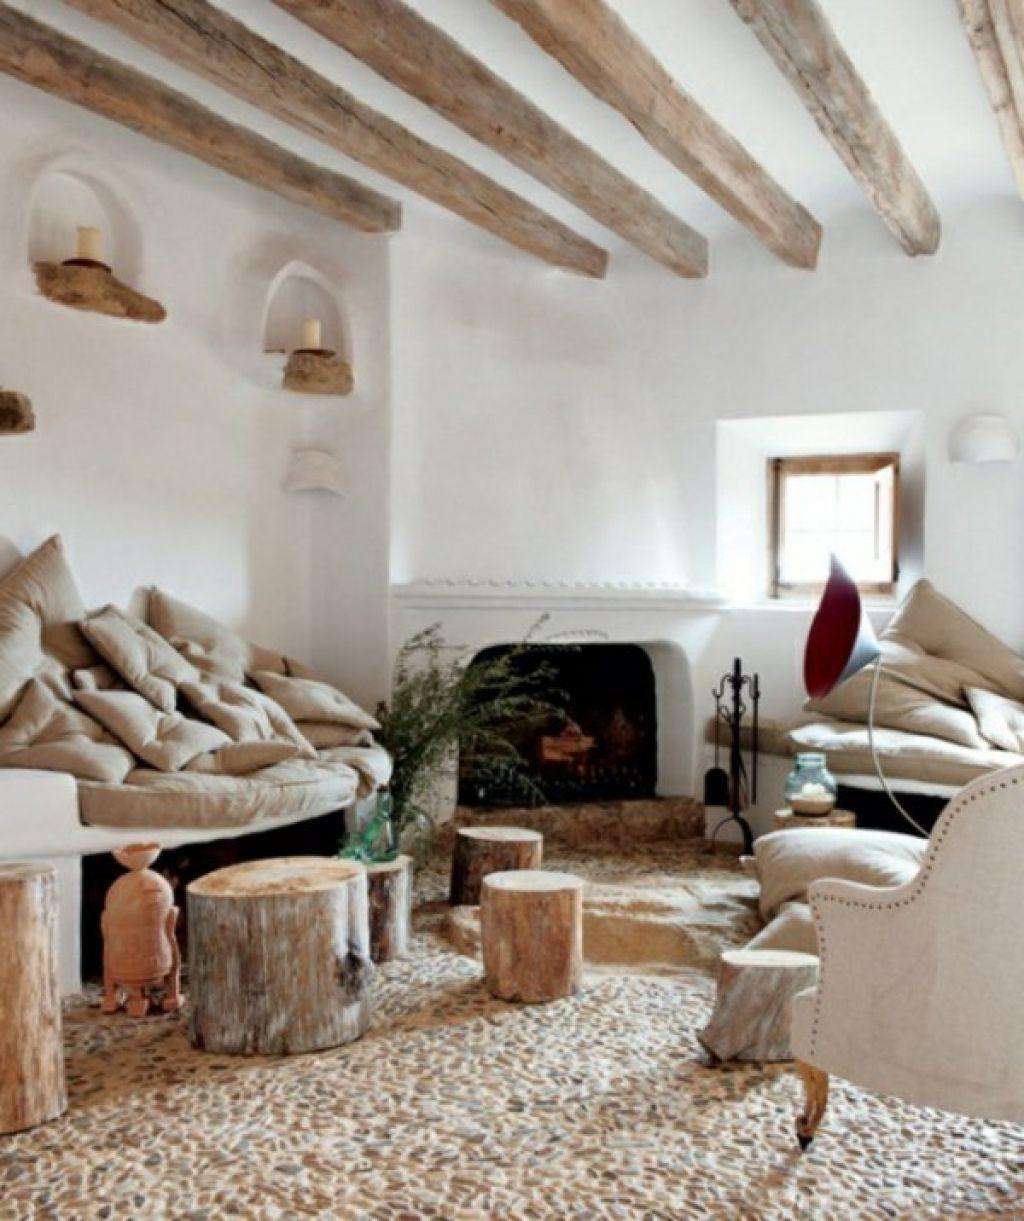 dekoideen wohnzimmer selber machen 21 kreative deko ideen aus ... - Wohnzimmer Ideen Zum Selber Machen